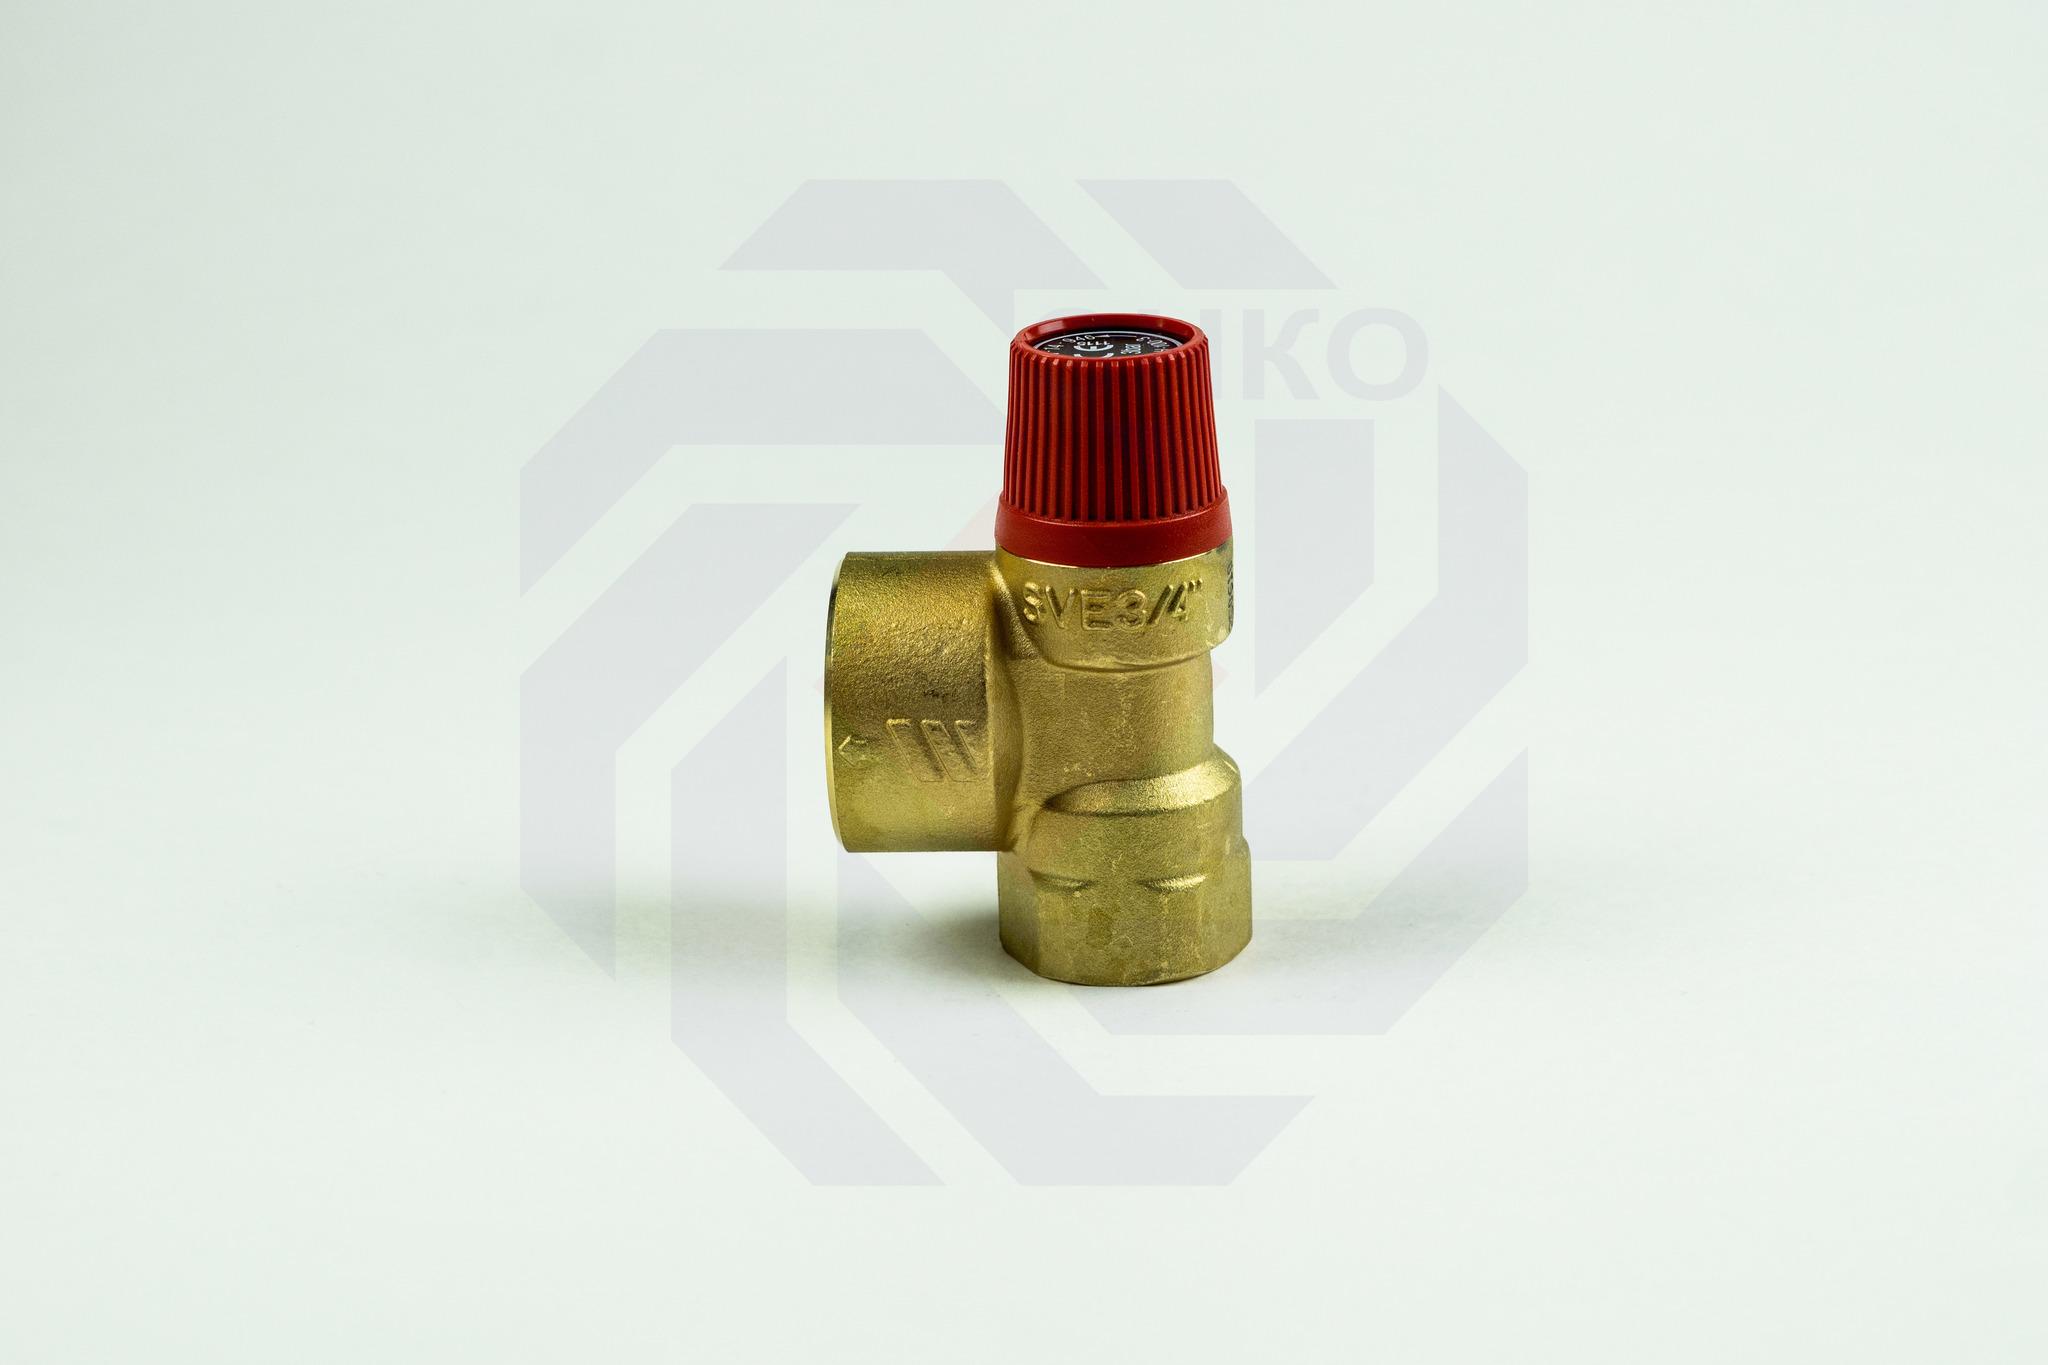 Клапан предохранительный WATTS SVH 3 бар ¾